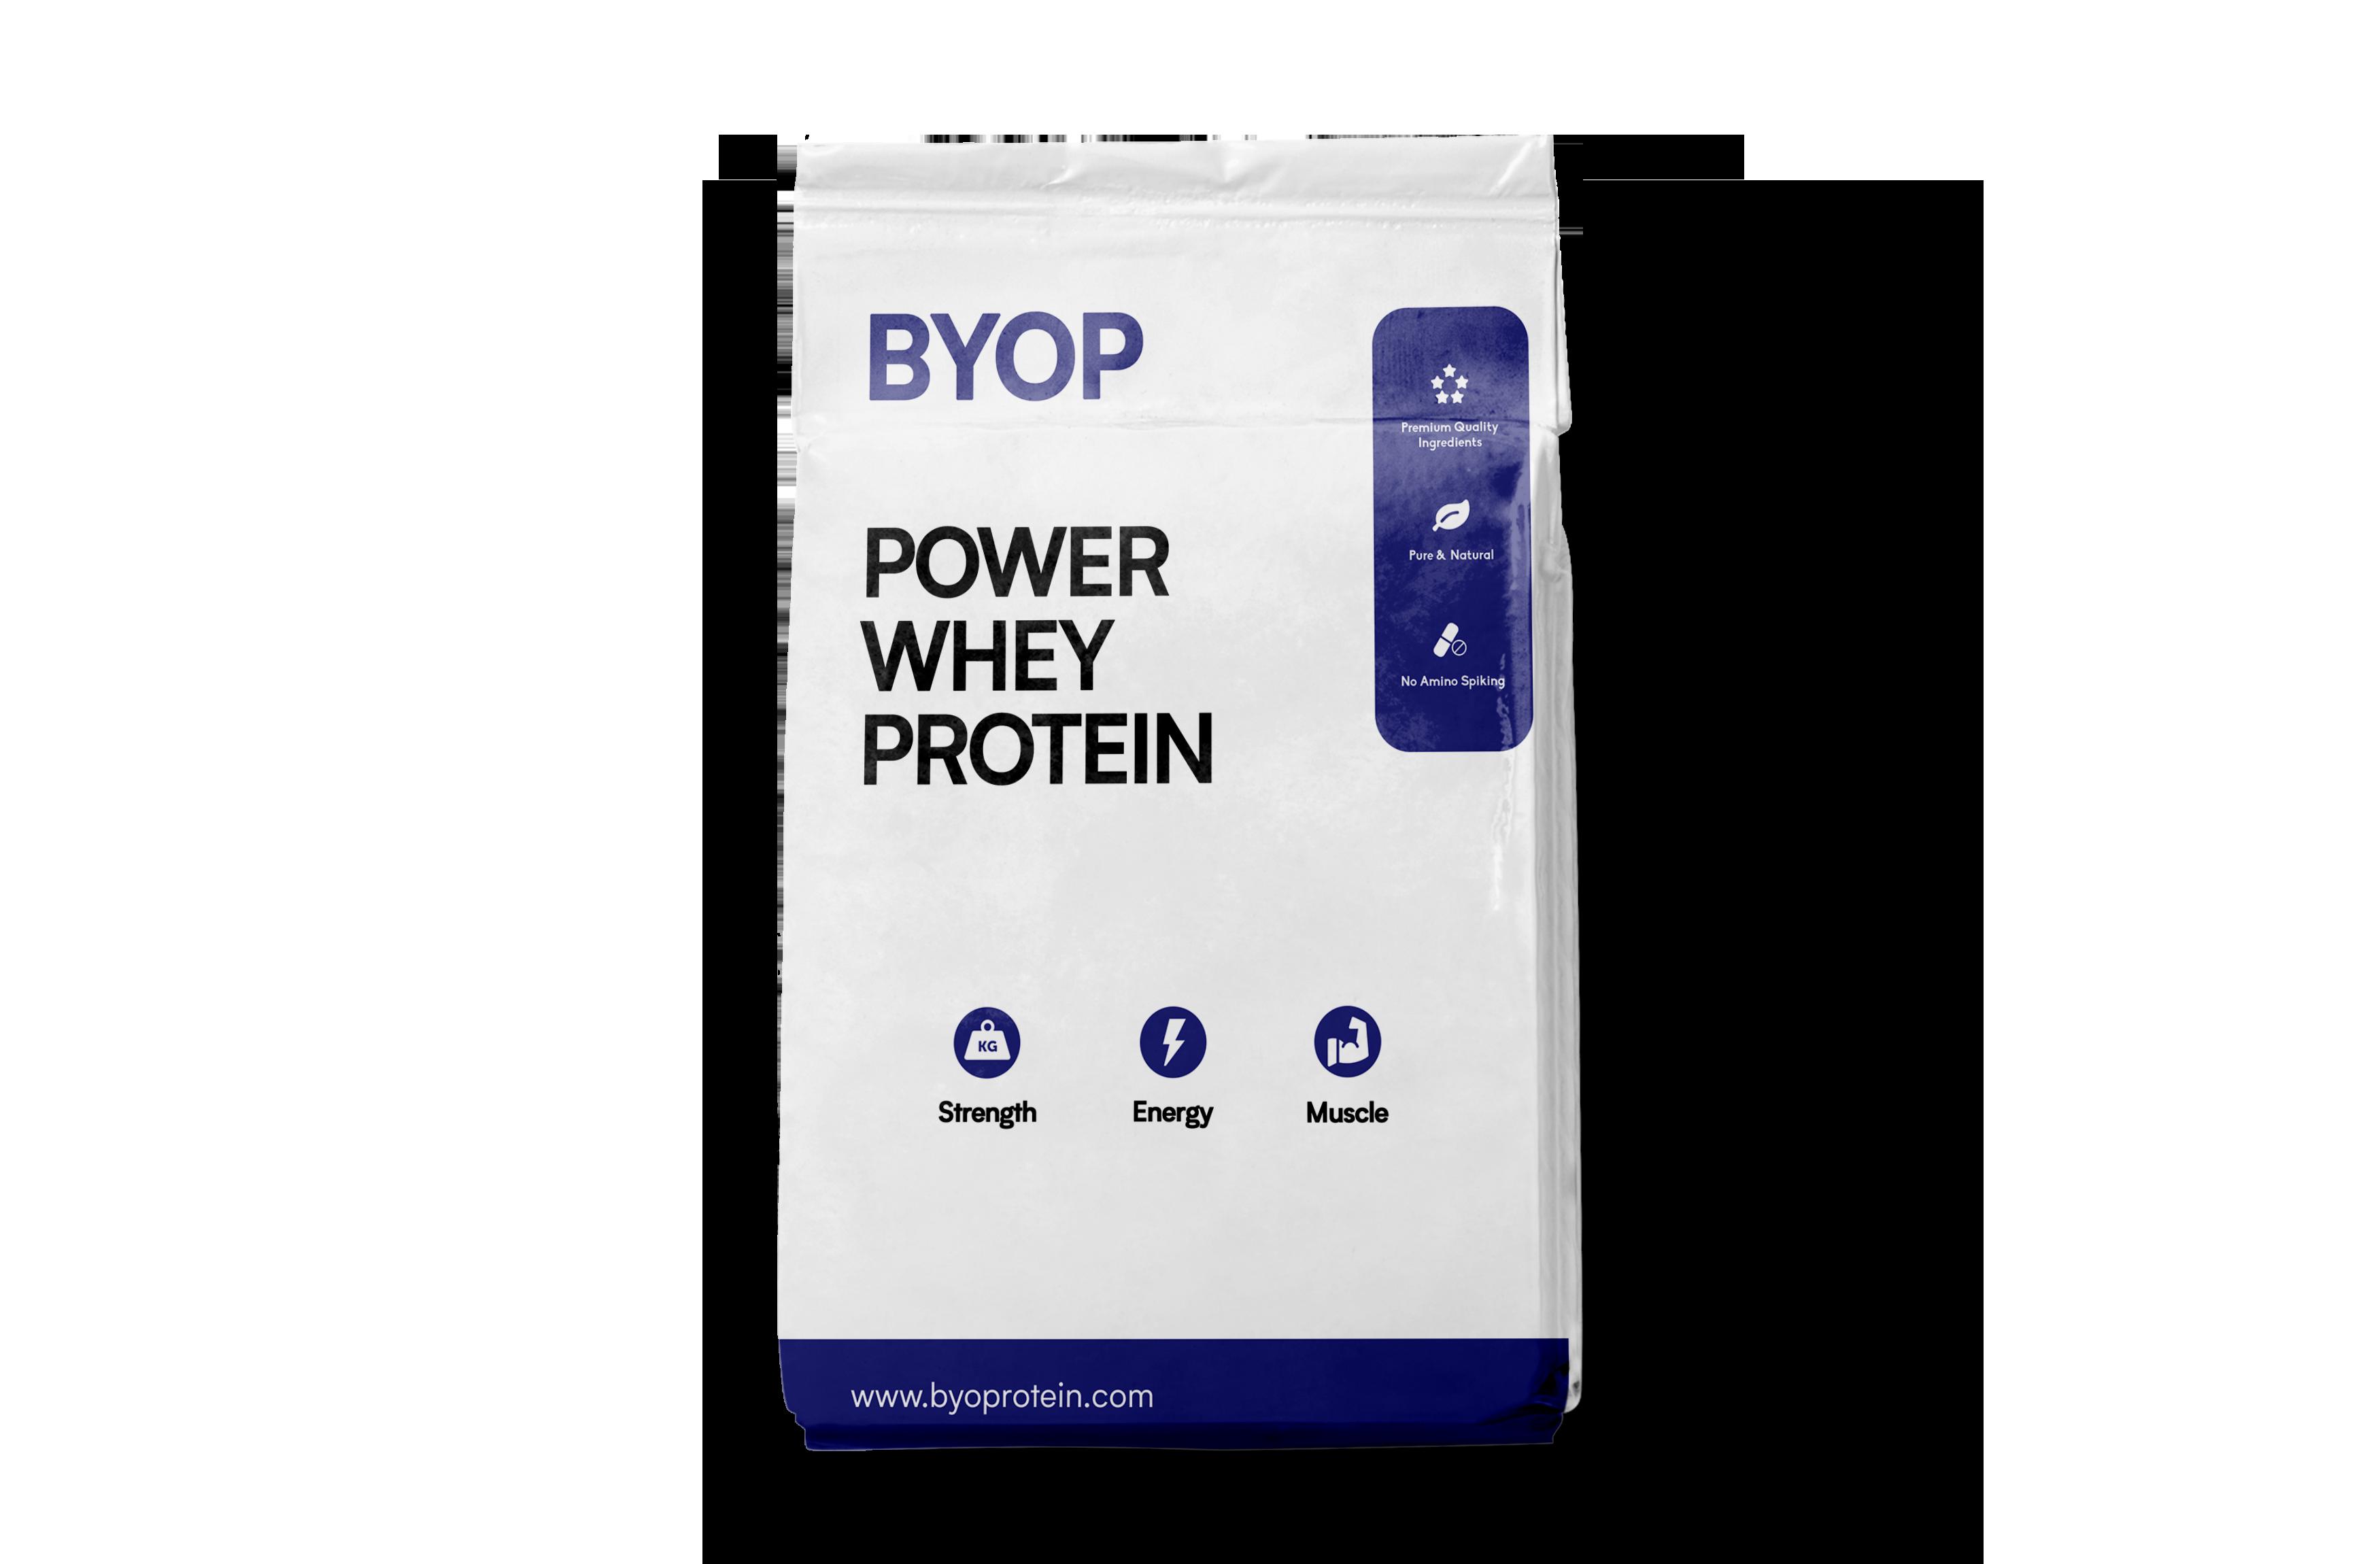 Power Whey Protein